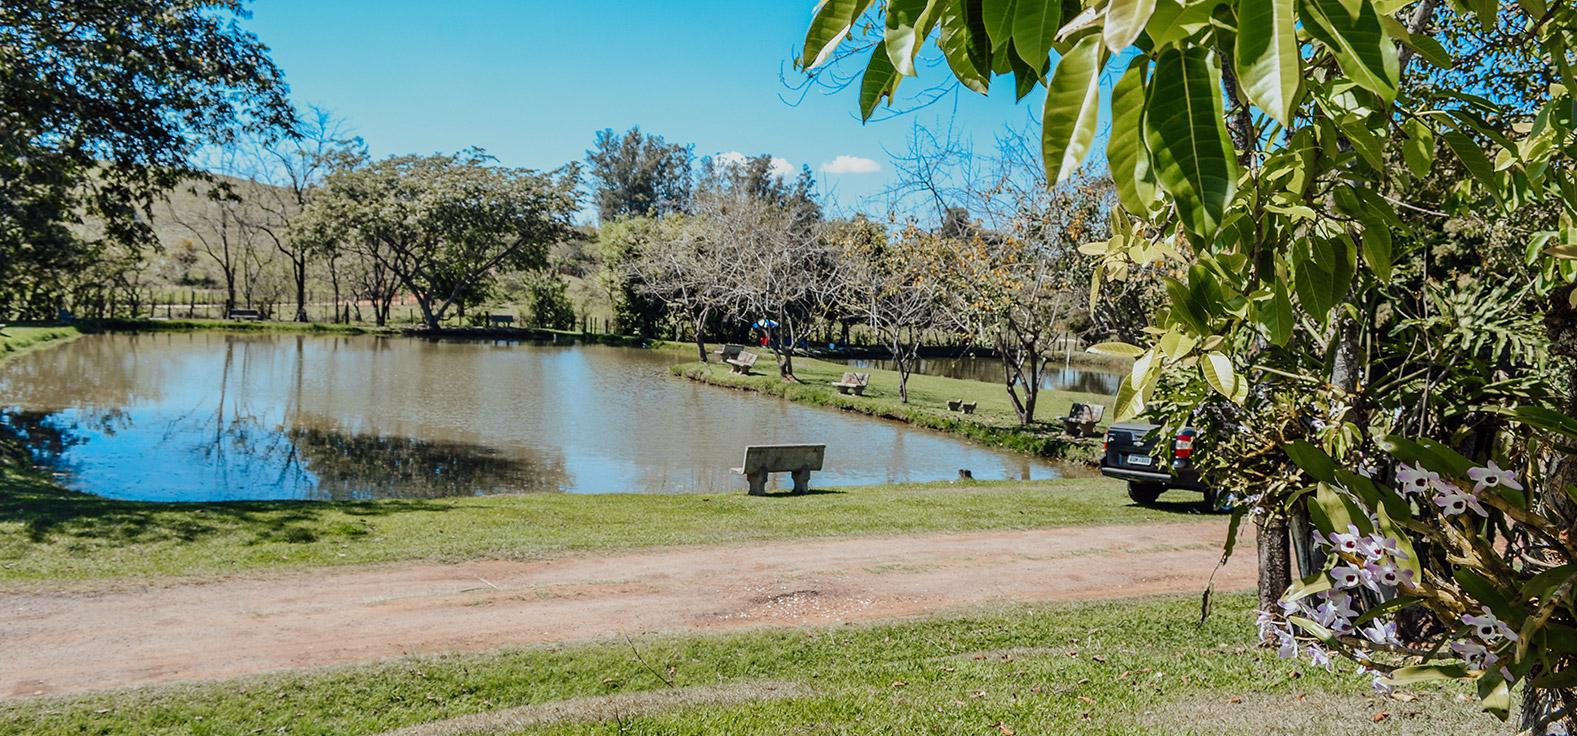 Pesqueiro Jacutinga em Corumbataí | Portal Serra do Itaquerí